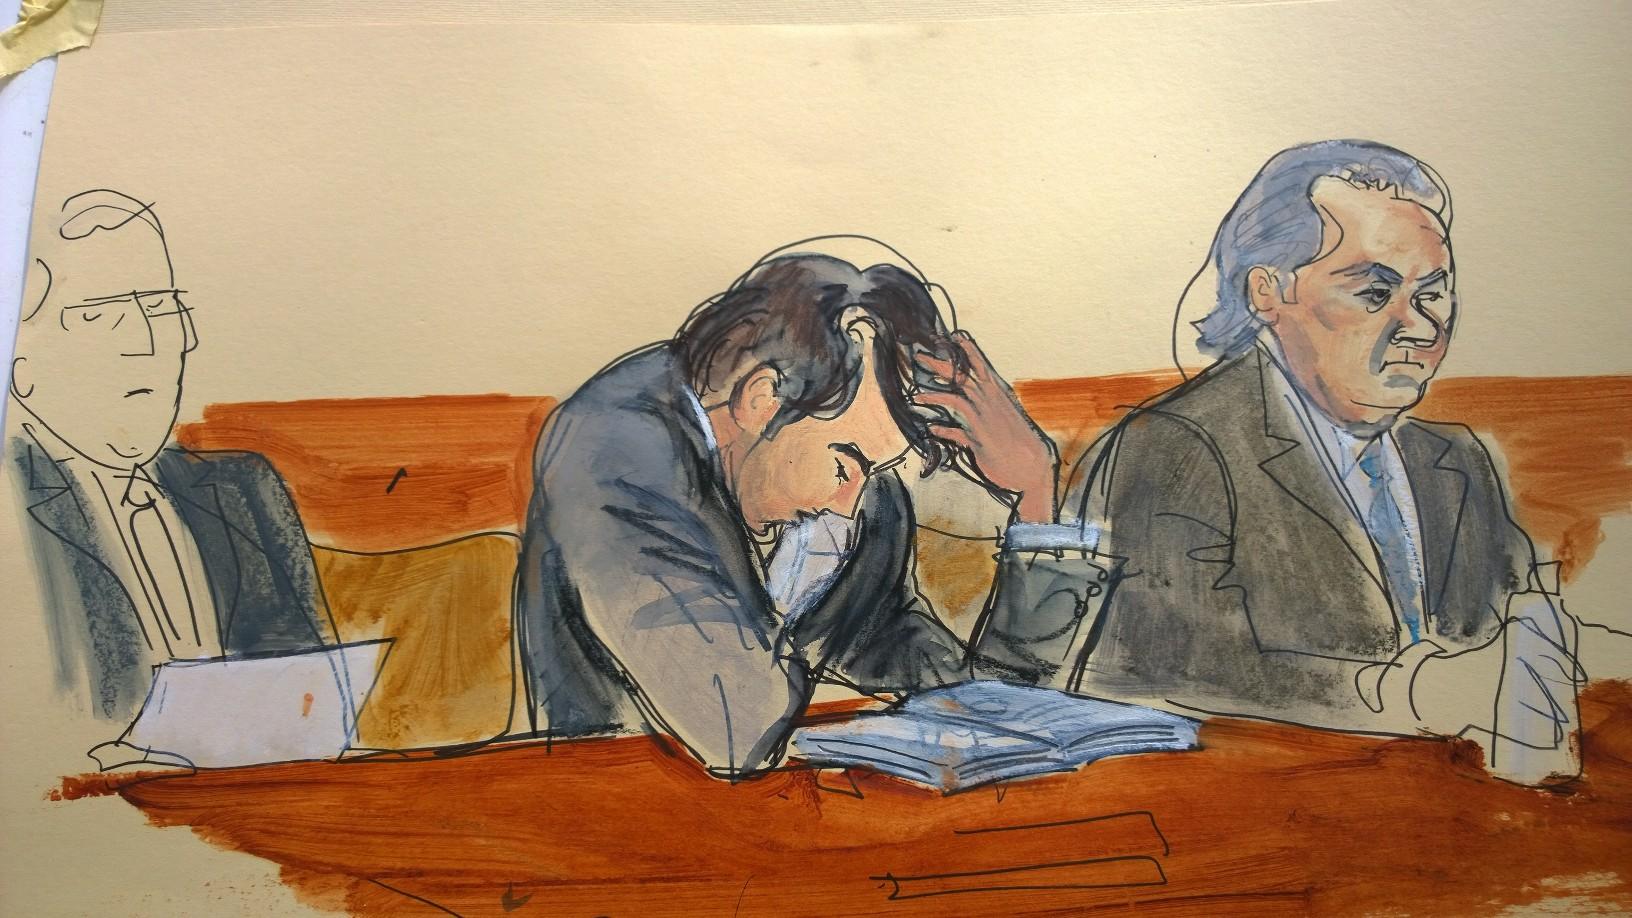 $65M at stake in fraud trial for 'Pharma Bro' Martin Shkreli